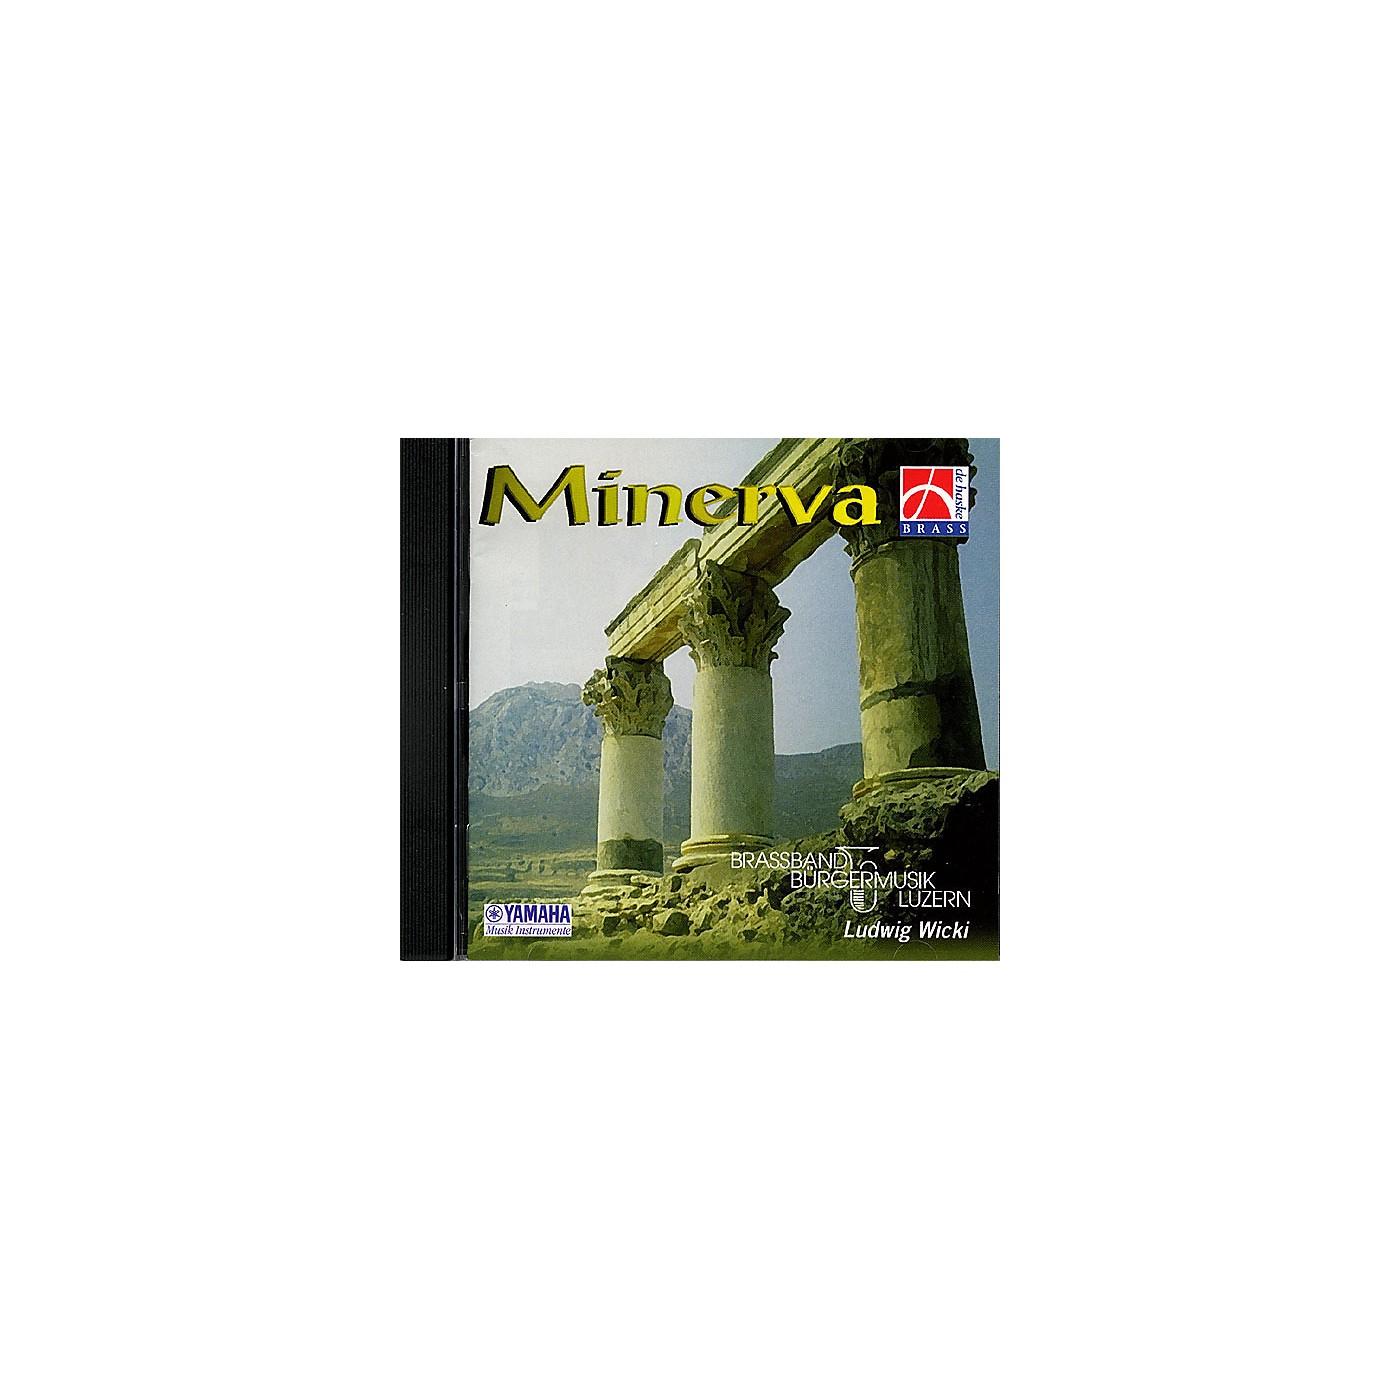 De Haske Music Minerva CD (De Haske Brass Band Sampler CD) De Haske Brass Band CD Series CD  by Various thumbnail